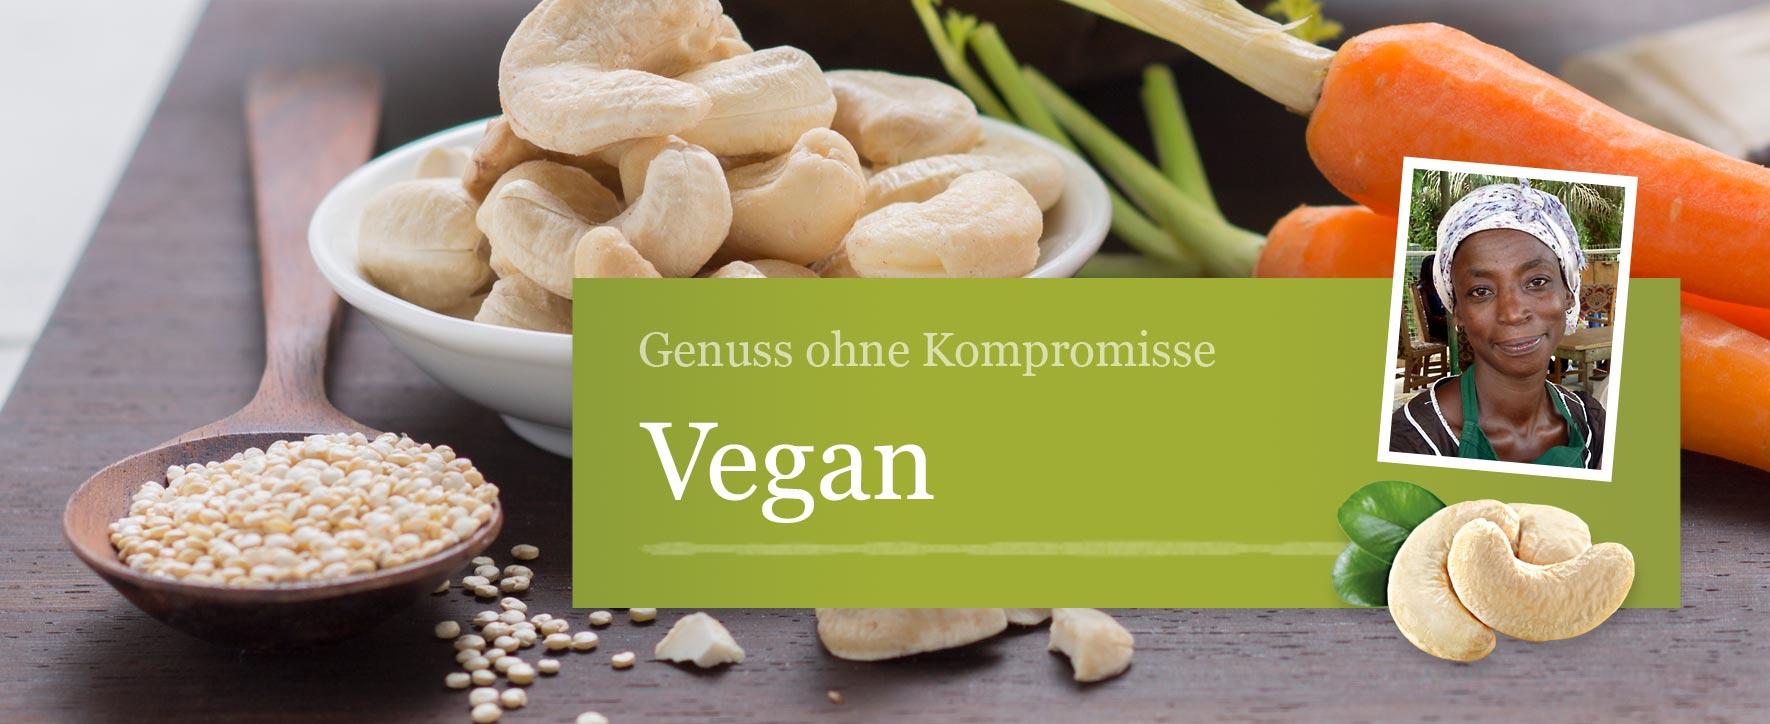 Vegane Produkte – Foto: GEPA - The Fair Trade Company / Sandra Eckhardt Fotografie